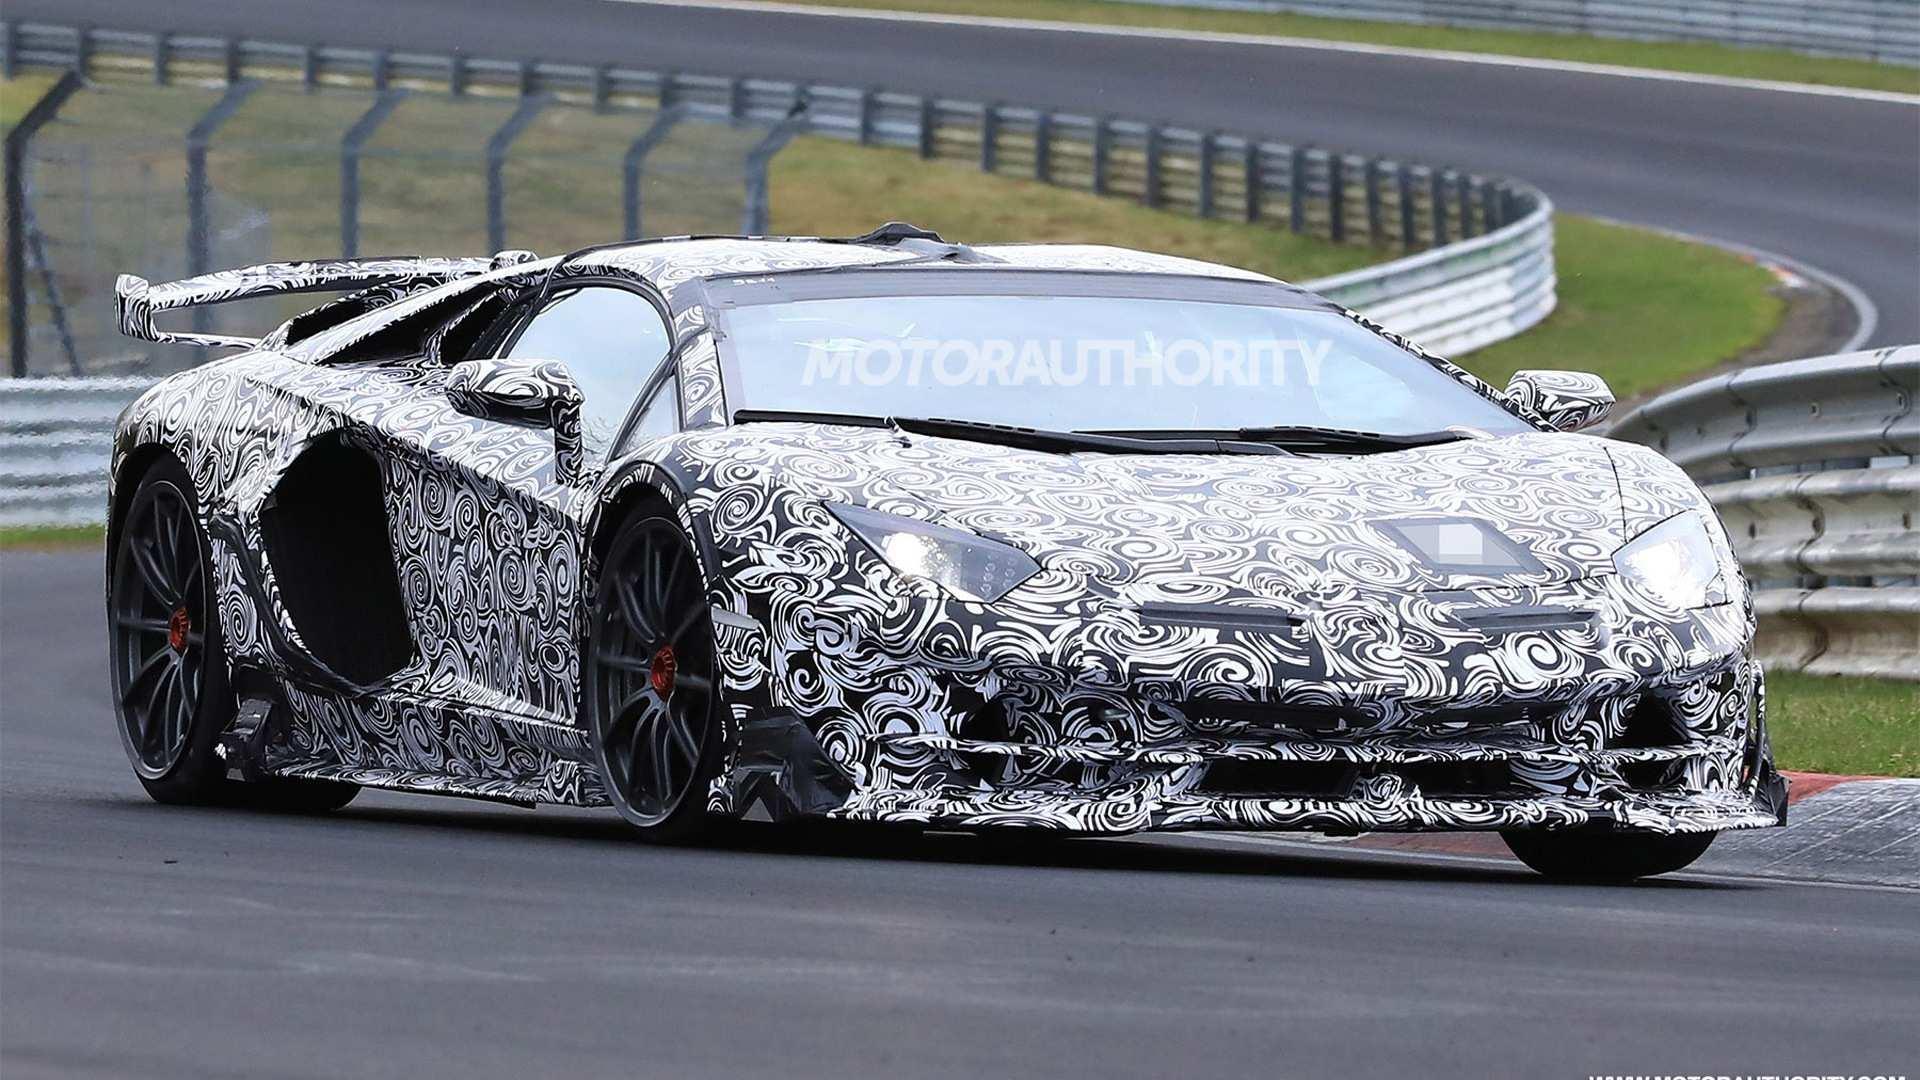 89 Great Lamborghini 2020 Models Redesign by Lamborghini 2020 Models